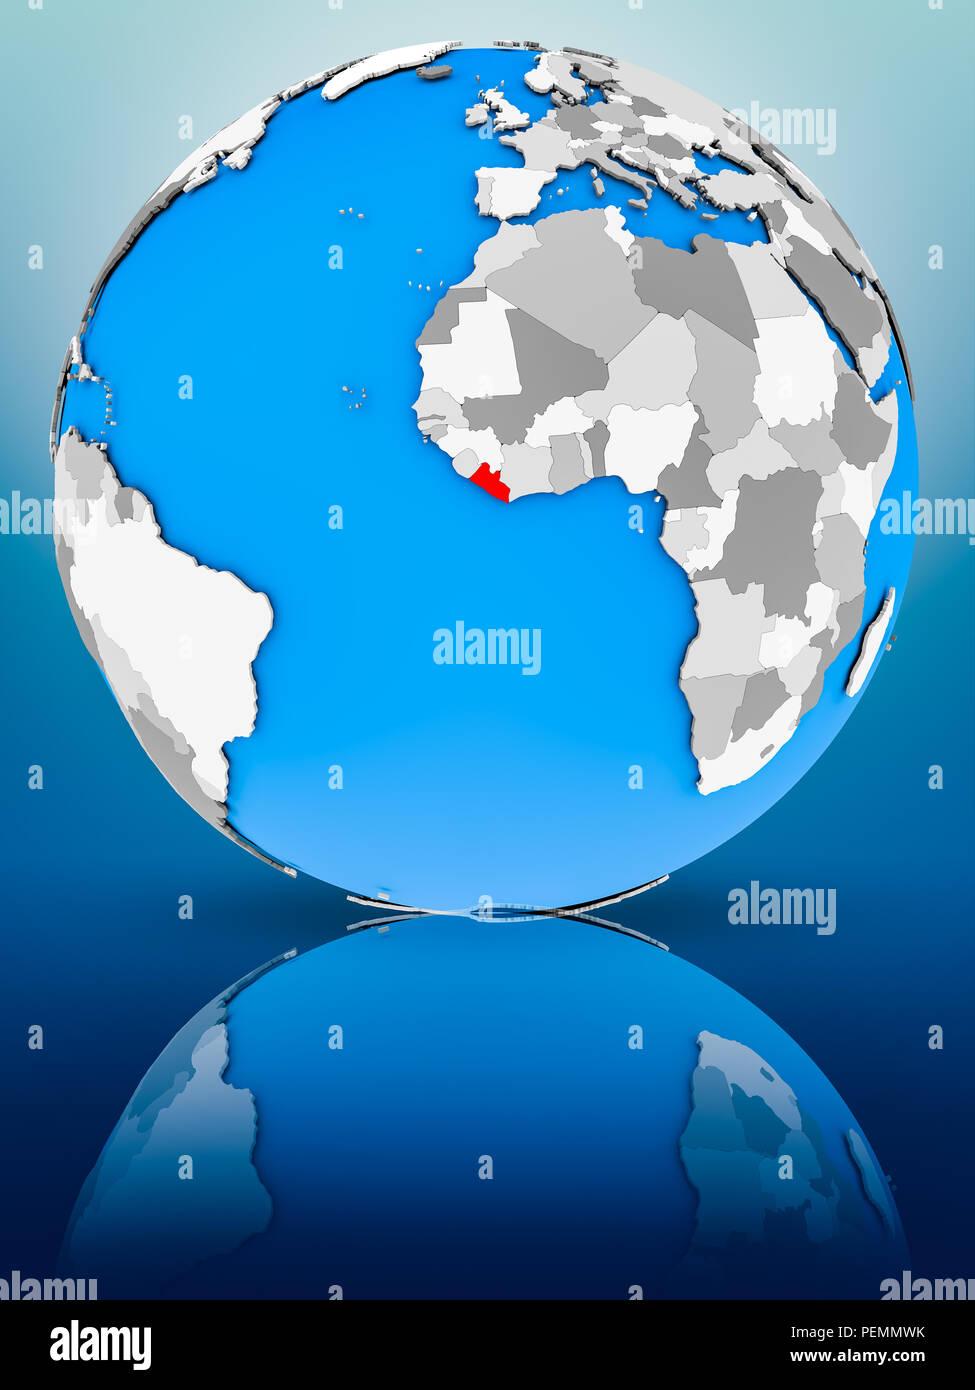 Liberia on globe reflecting on surface. 3D illustration. - Stock Image